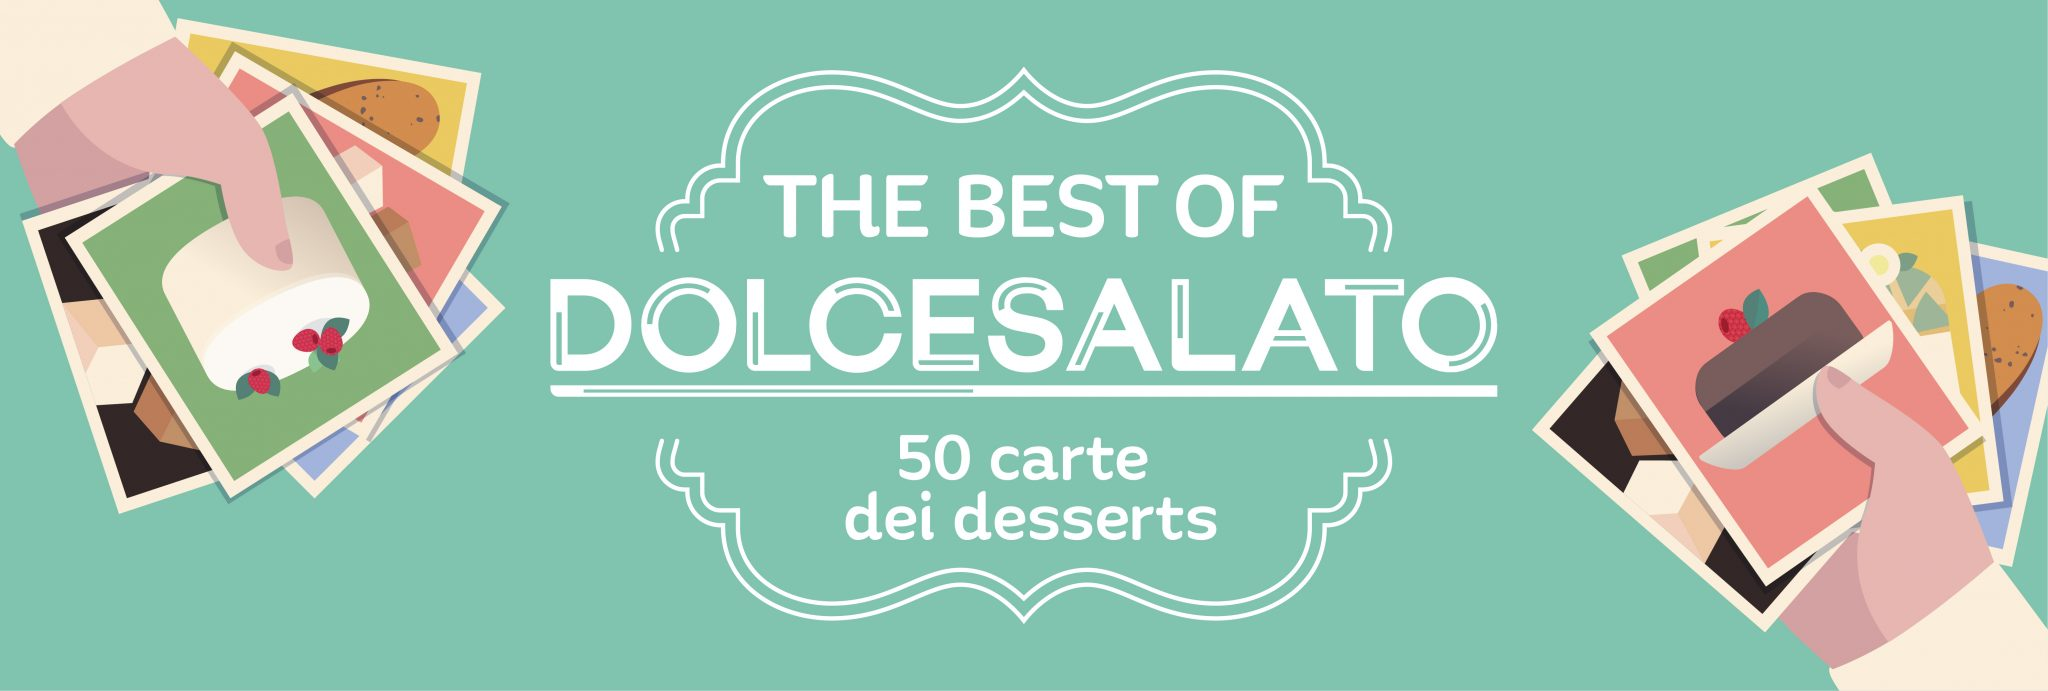 The Best of Dolcesalato - 50 Carte dei Desserts